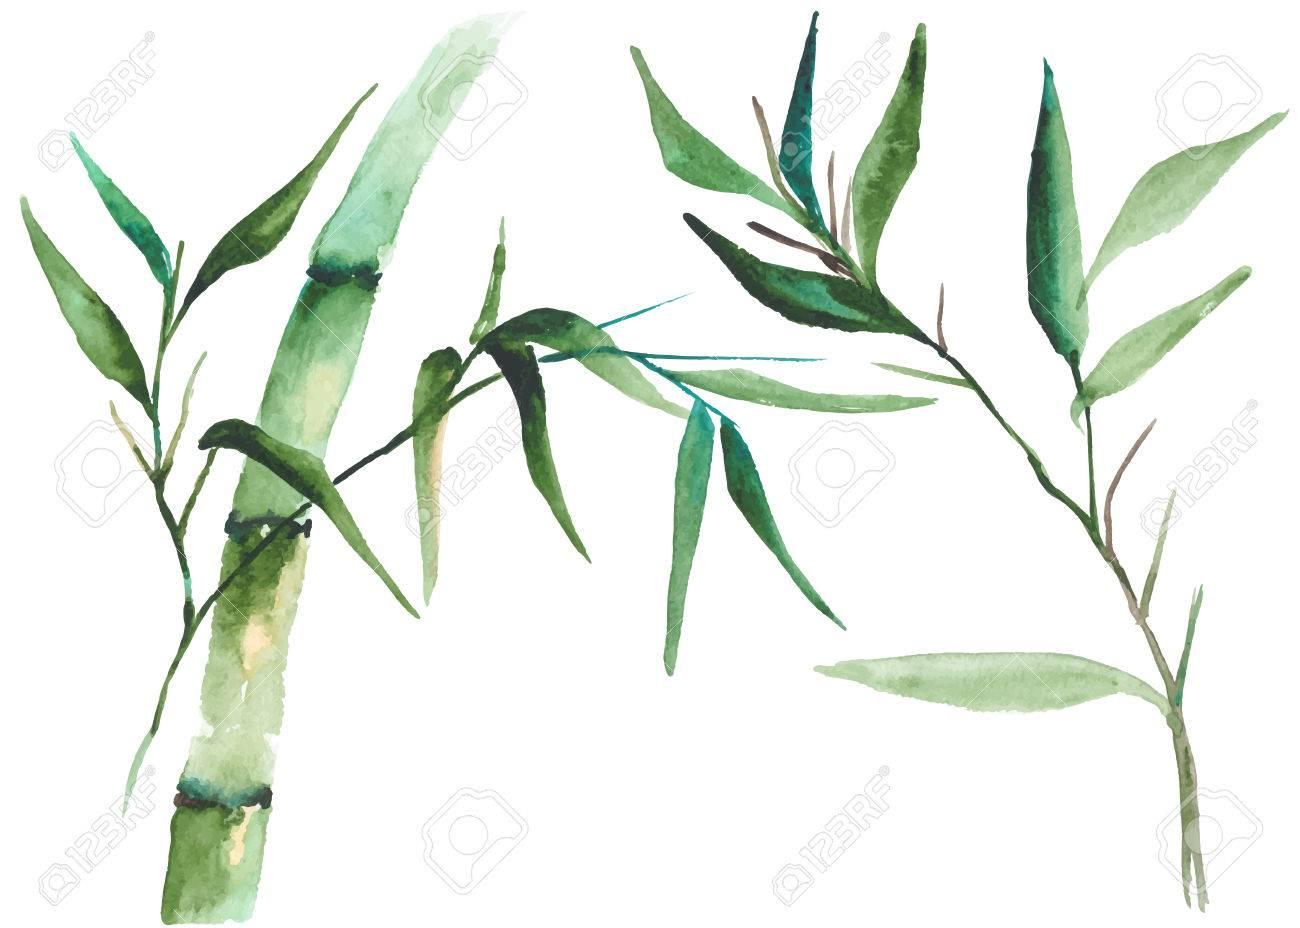 Watercolor bamboo illustration - 82678249